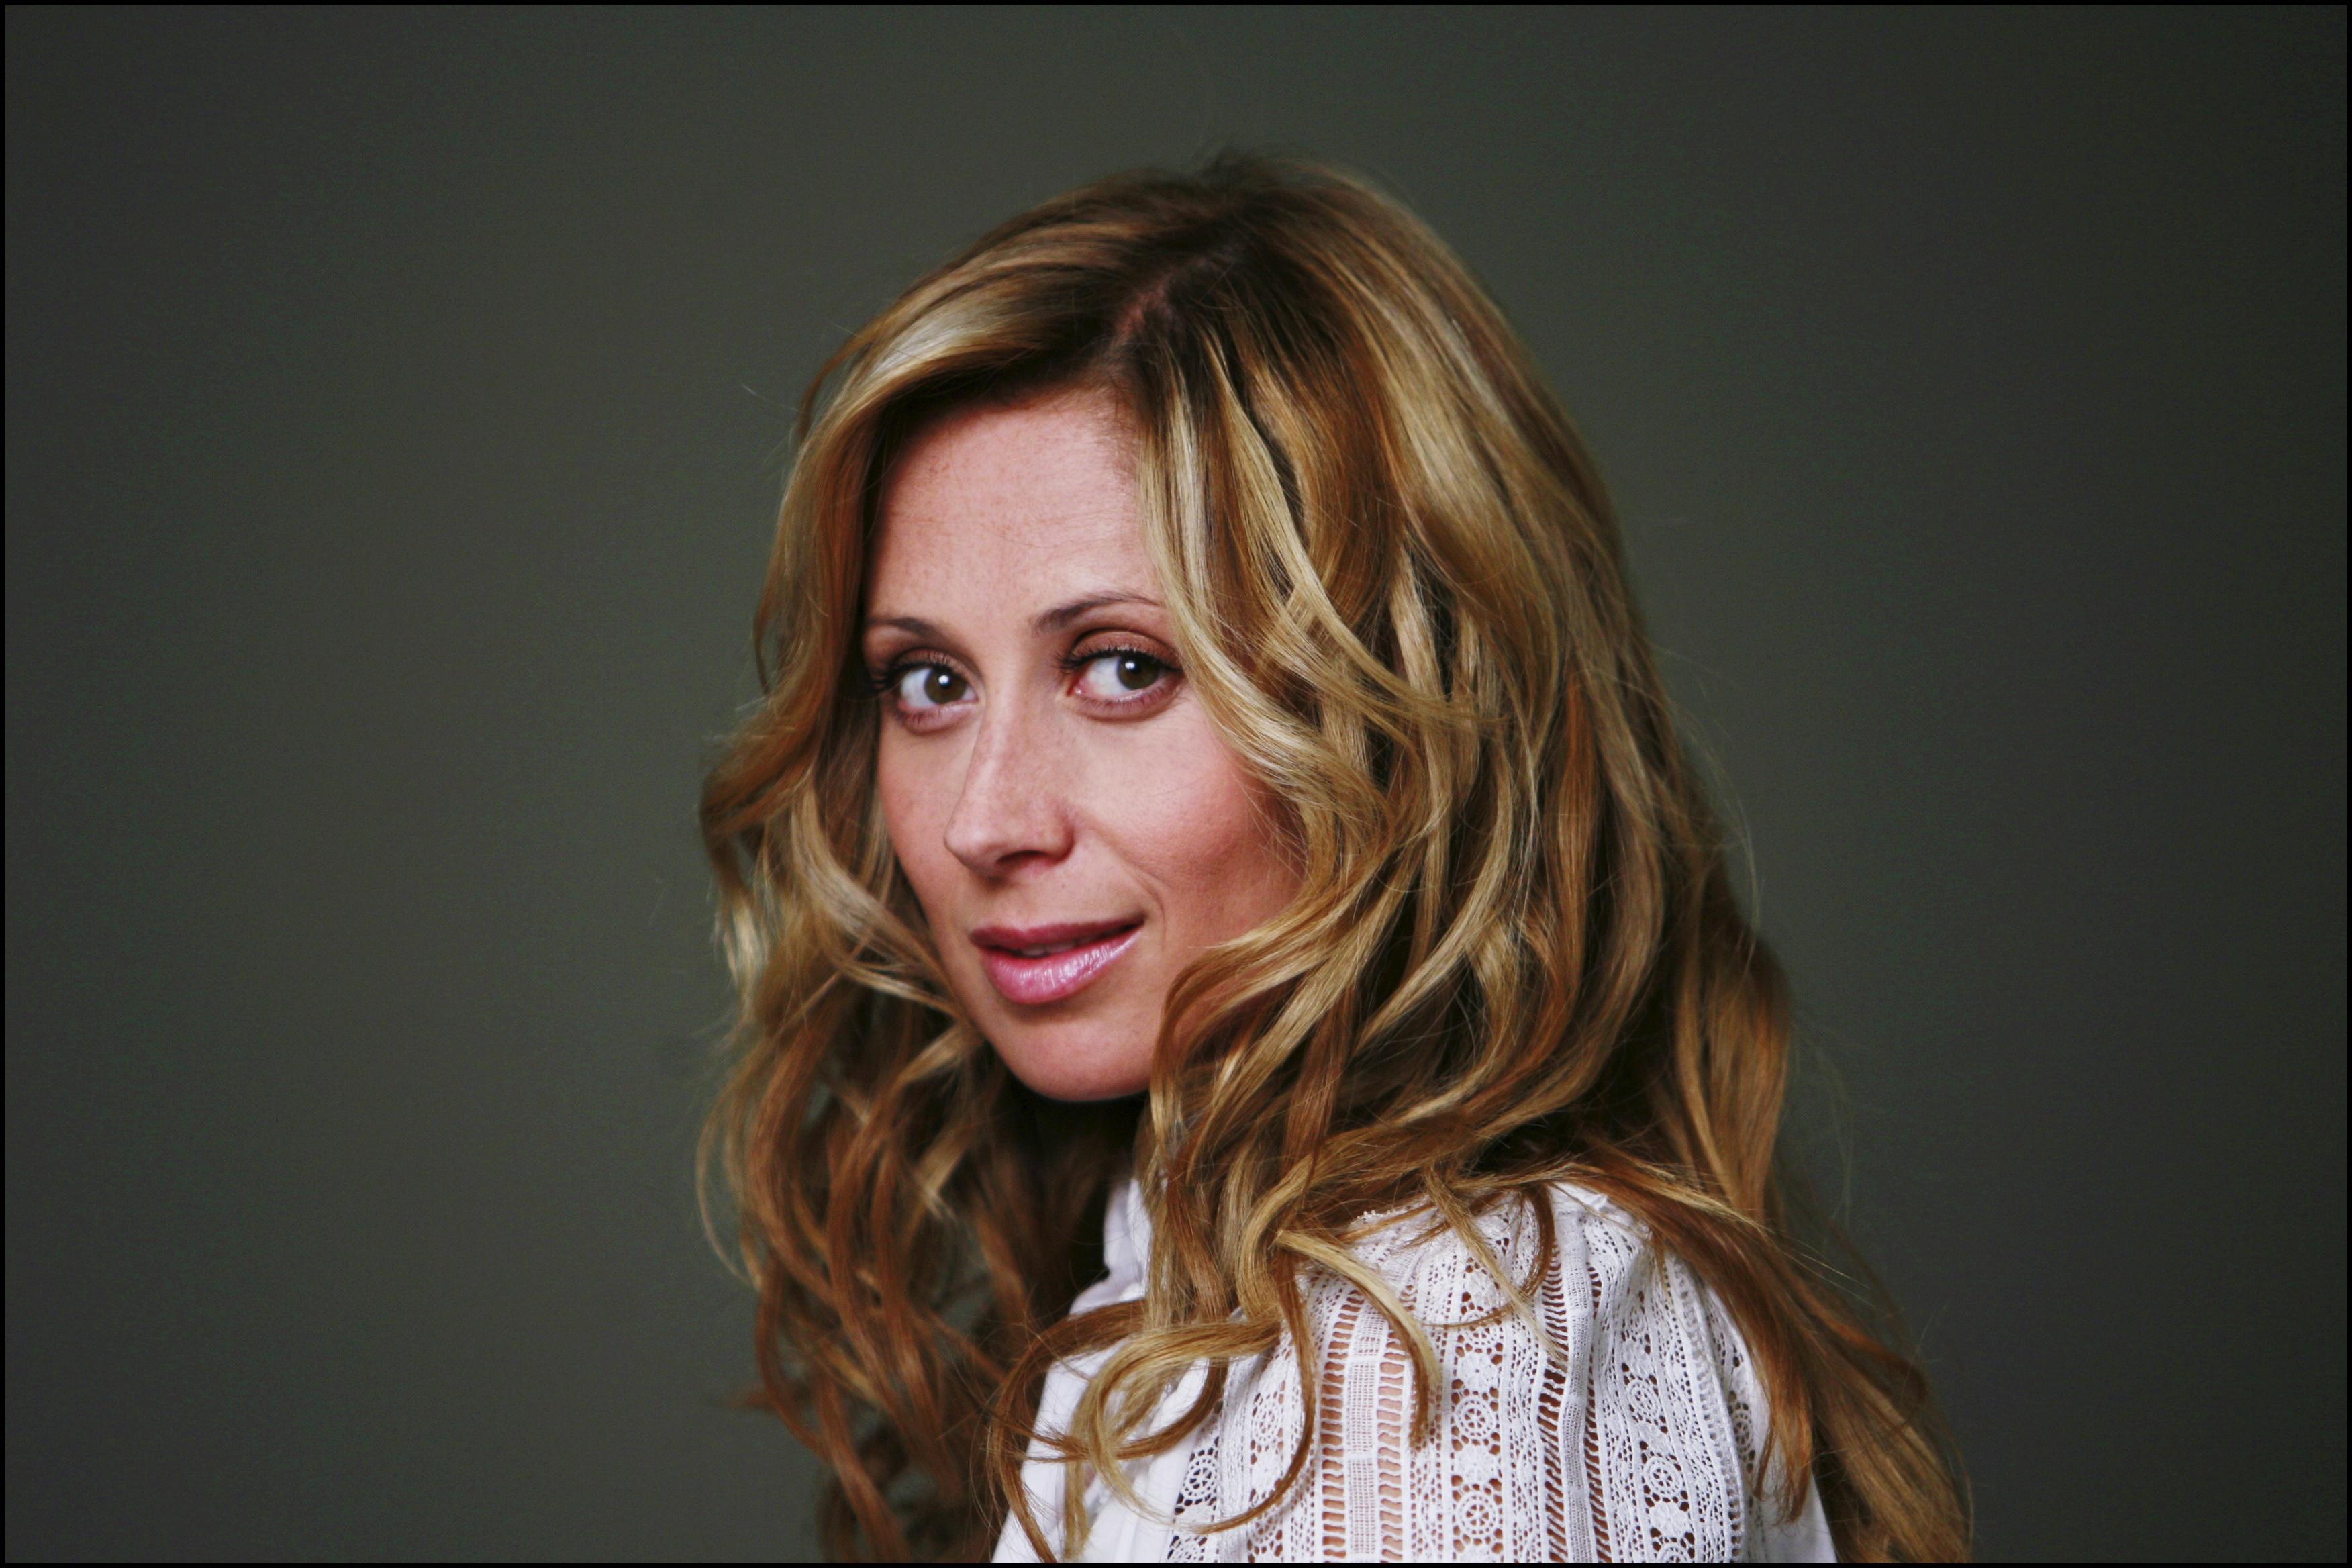 Lara Fabian Images